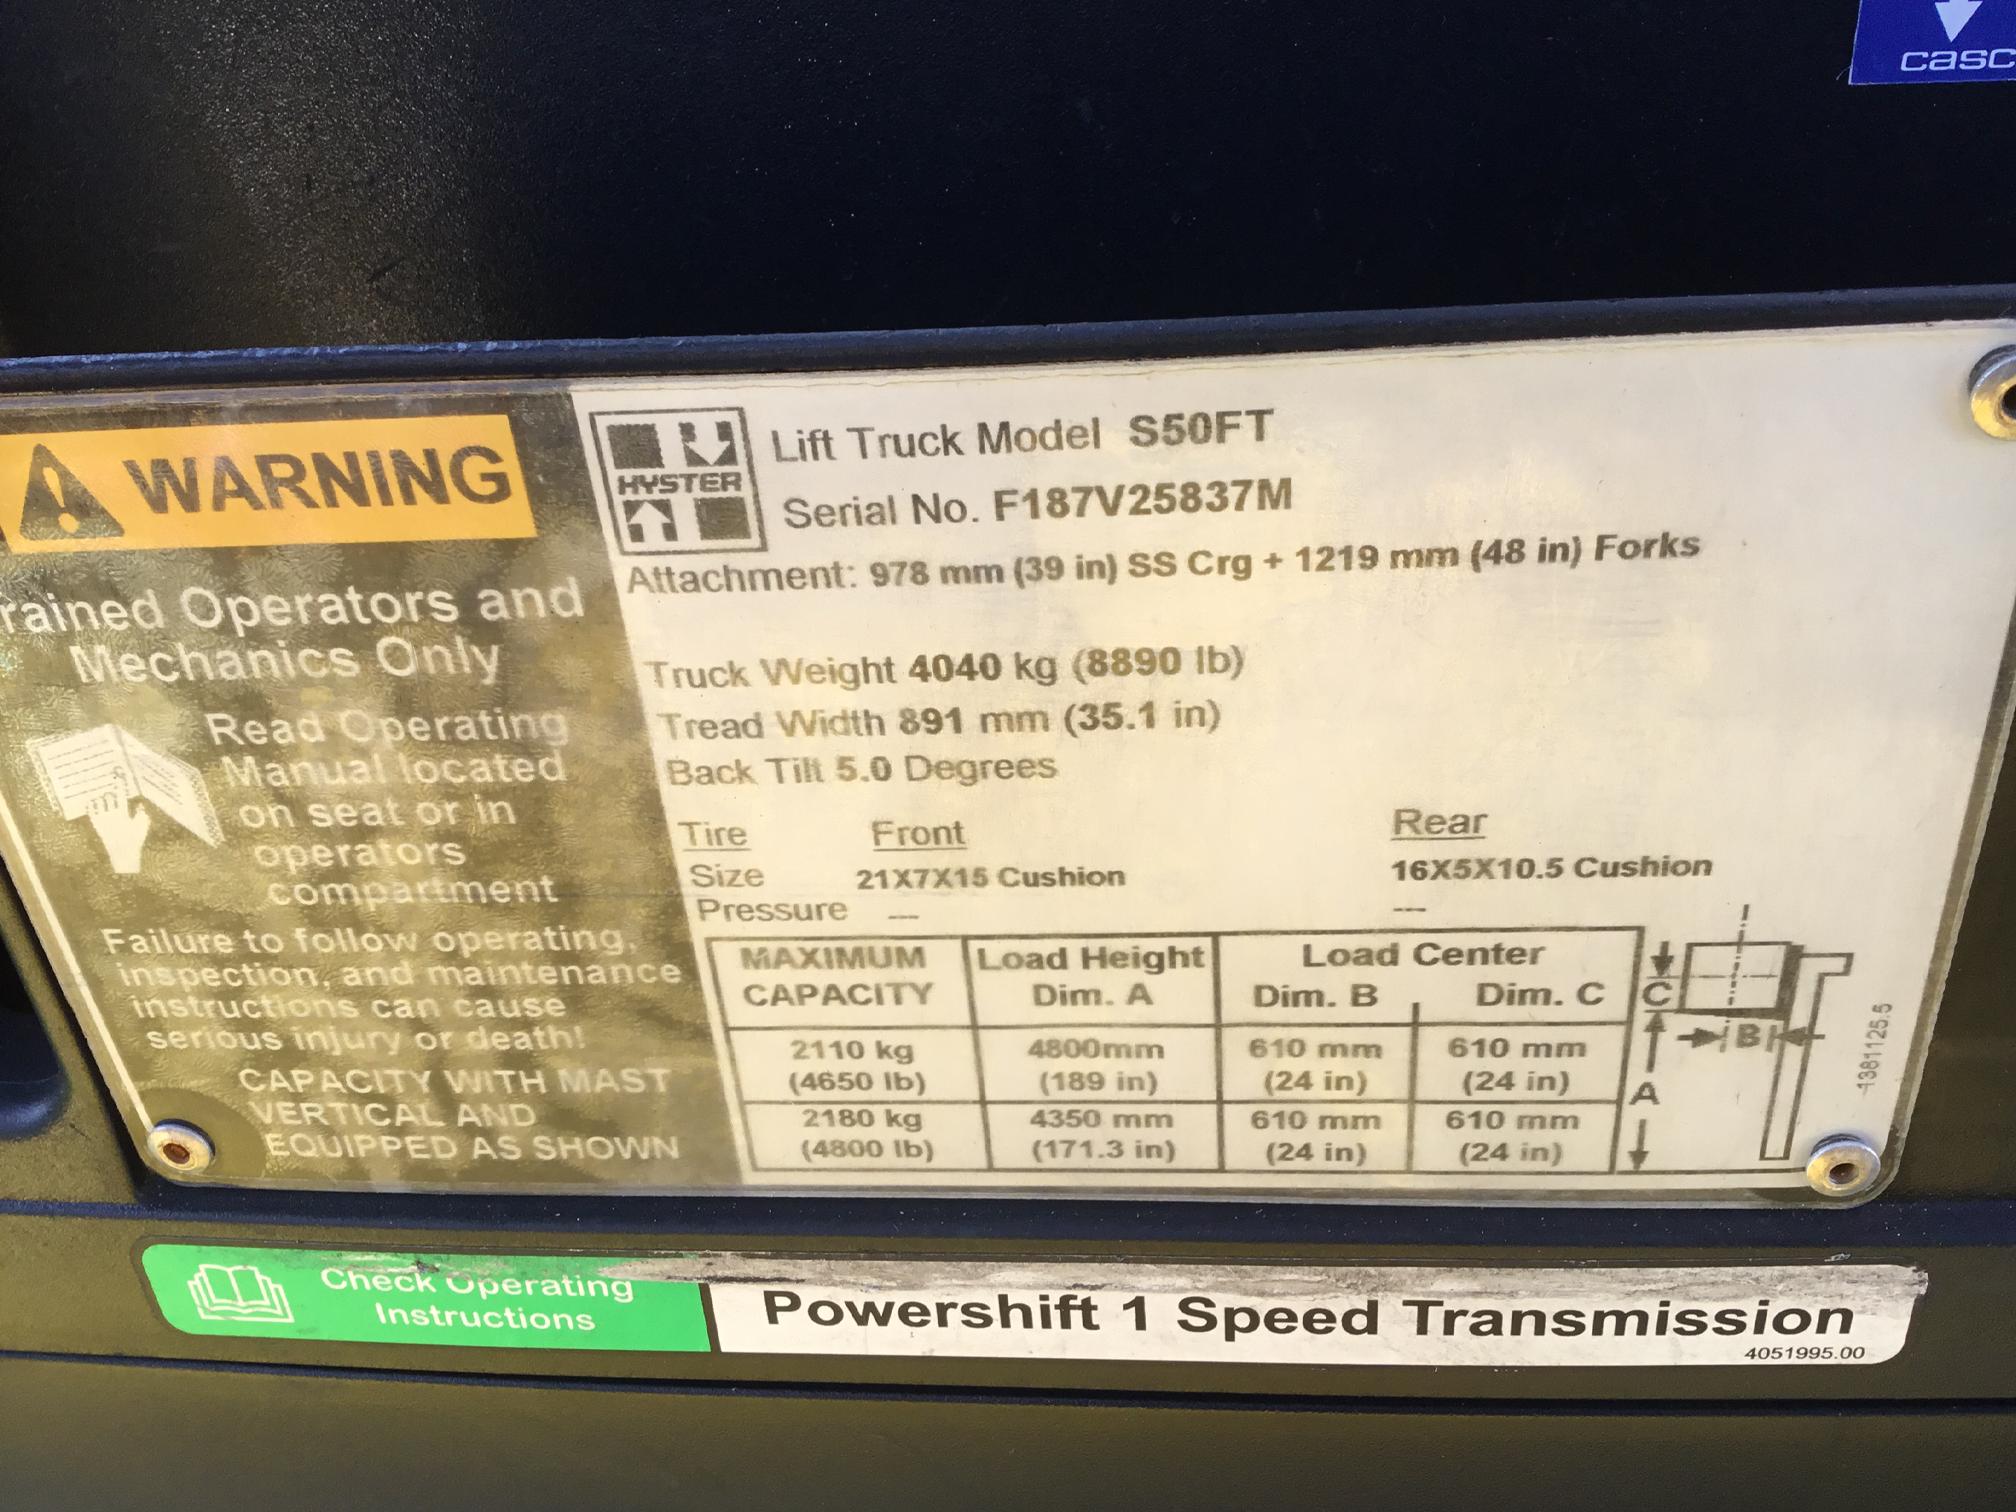 Hyster 240863 lift truck model info